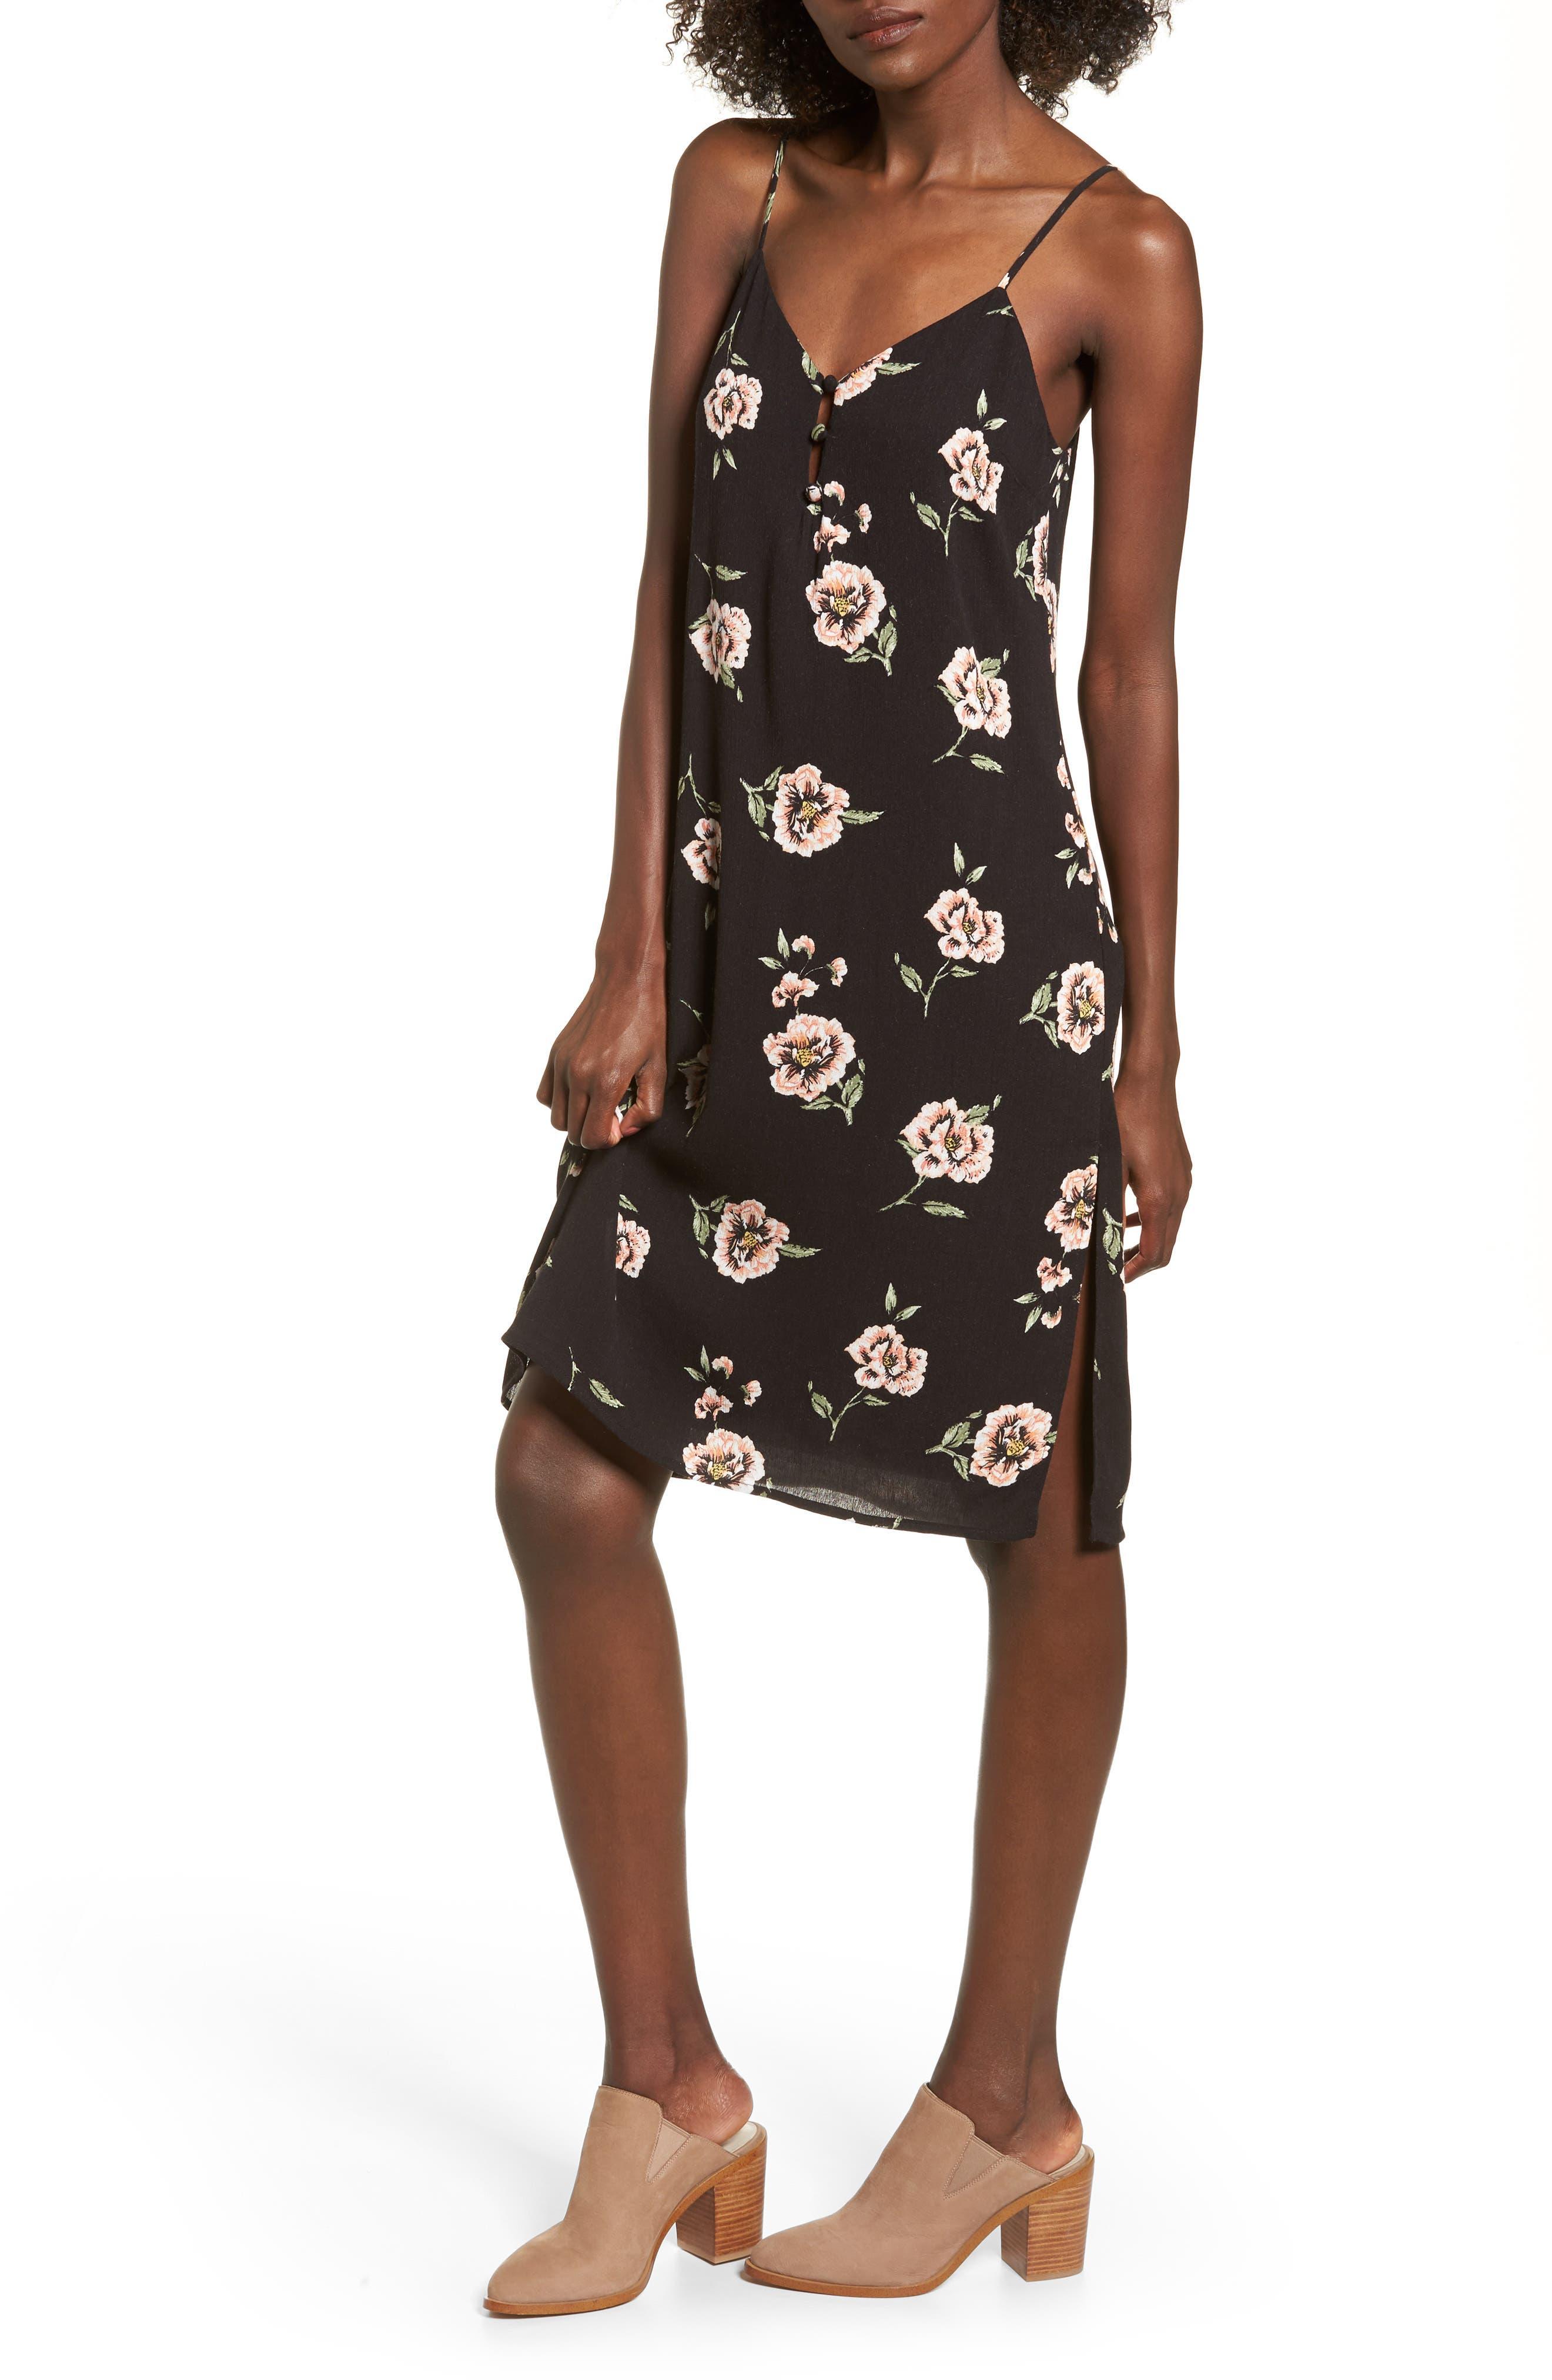 Alternate Image 1 Selected - Dee Elly Floral Slipdress